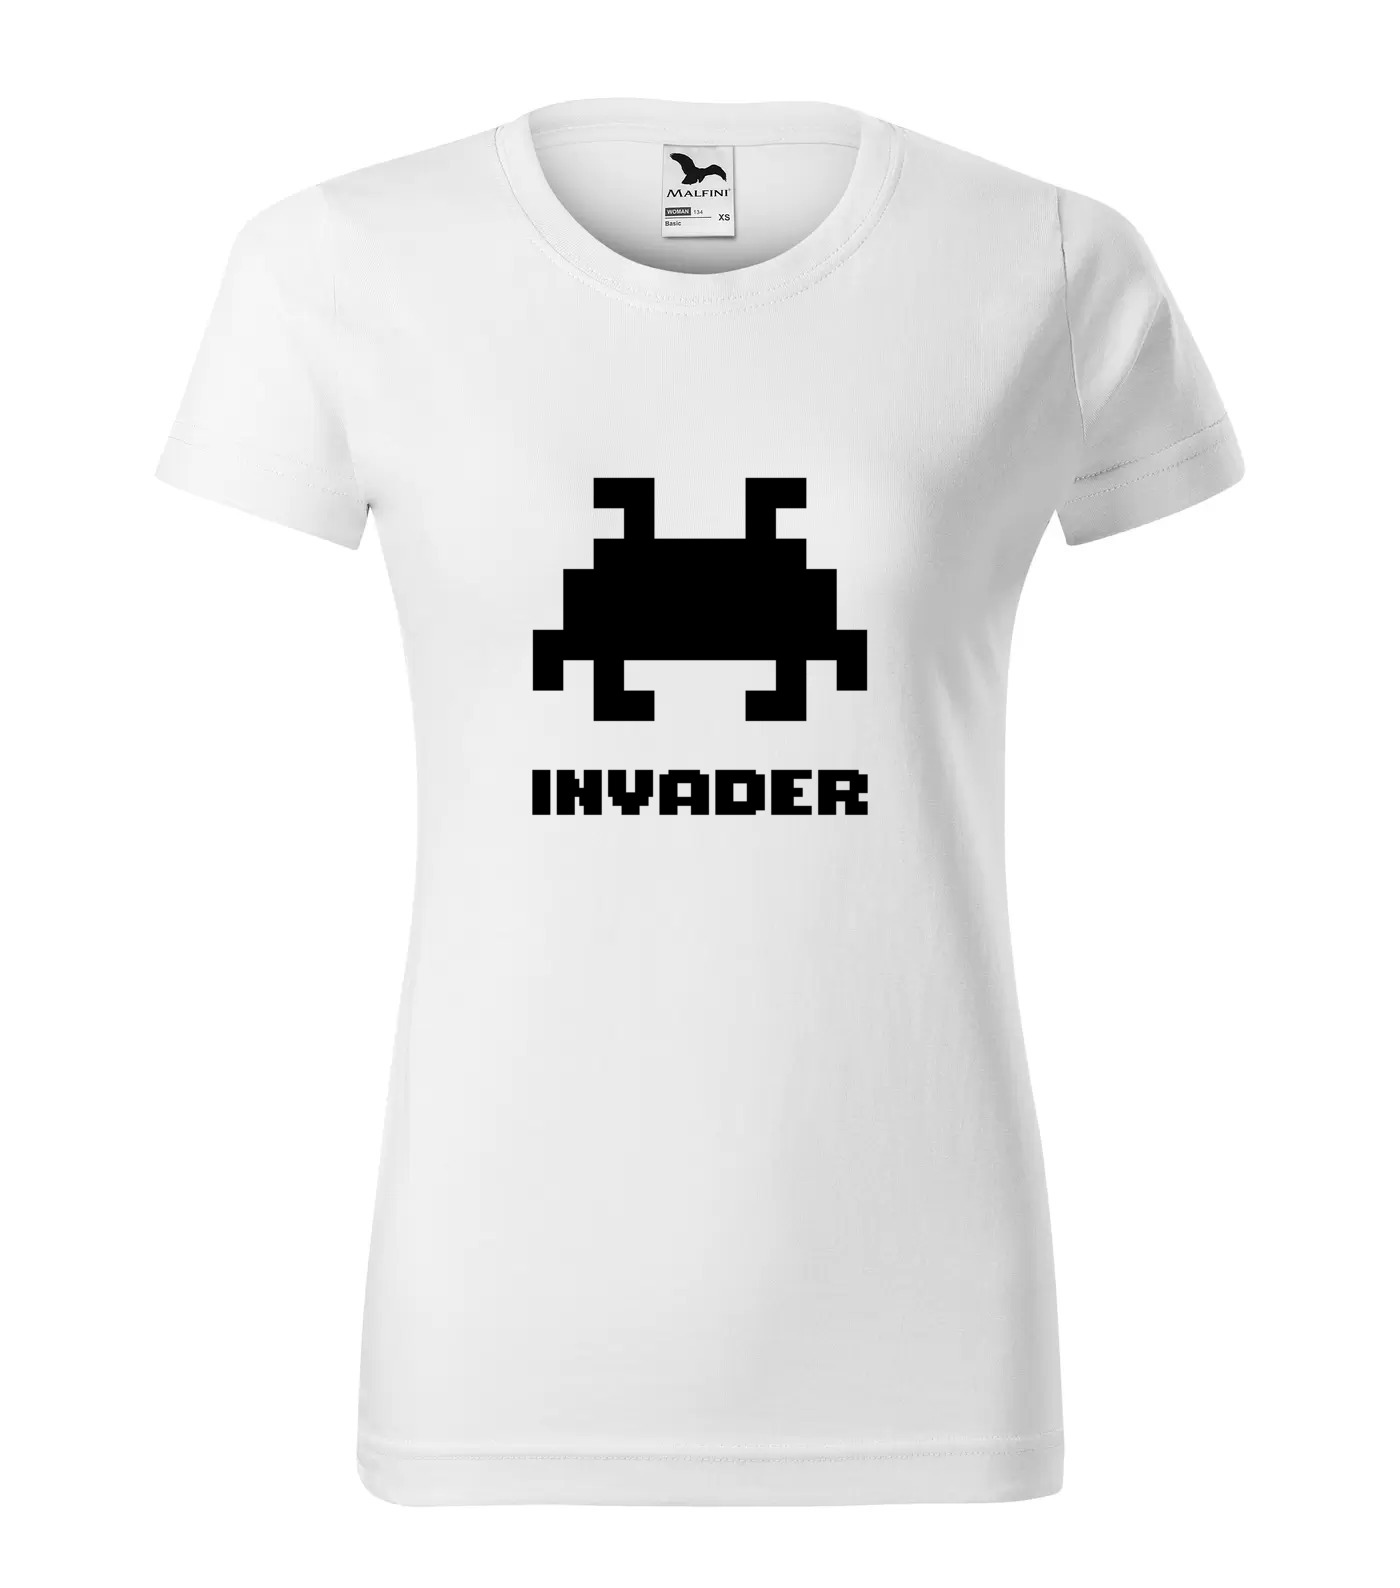 Tričko Geeks and Nerds Invader